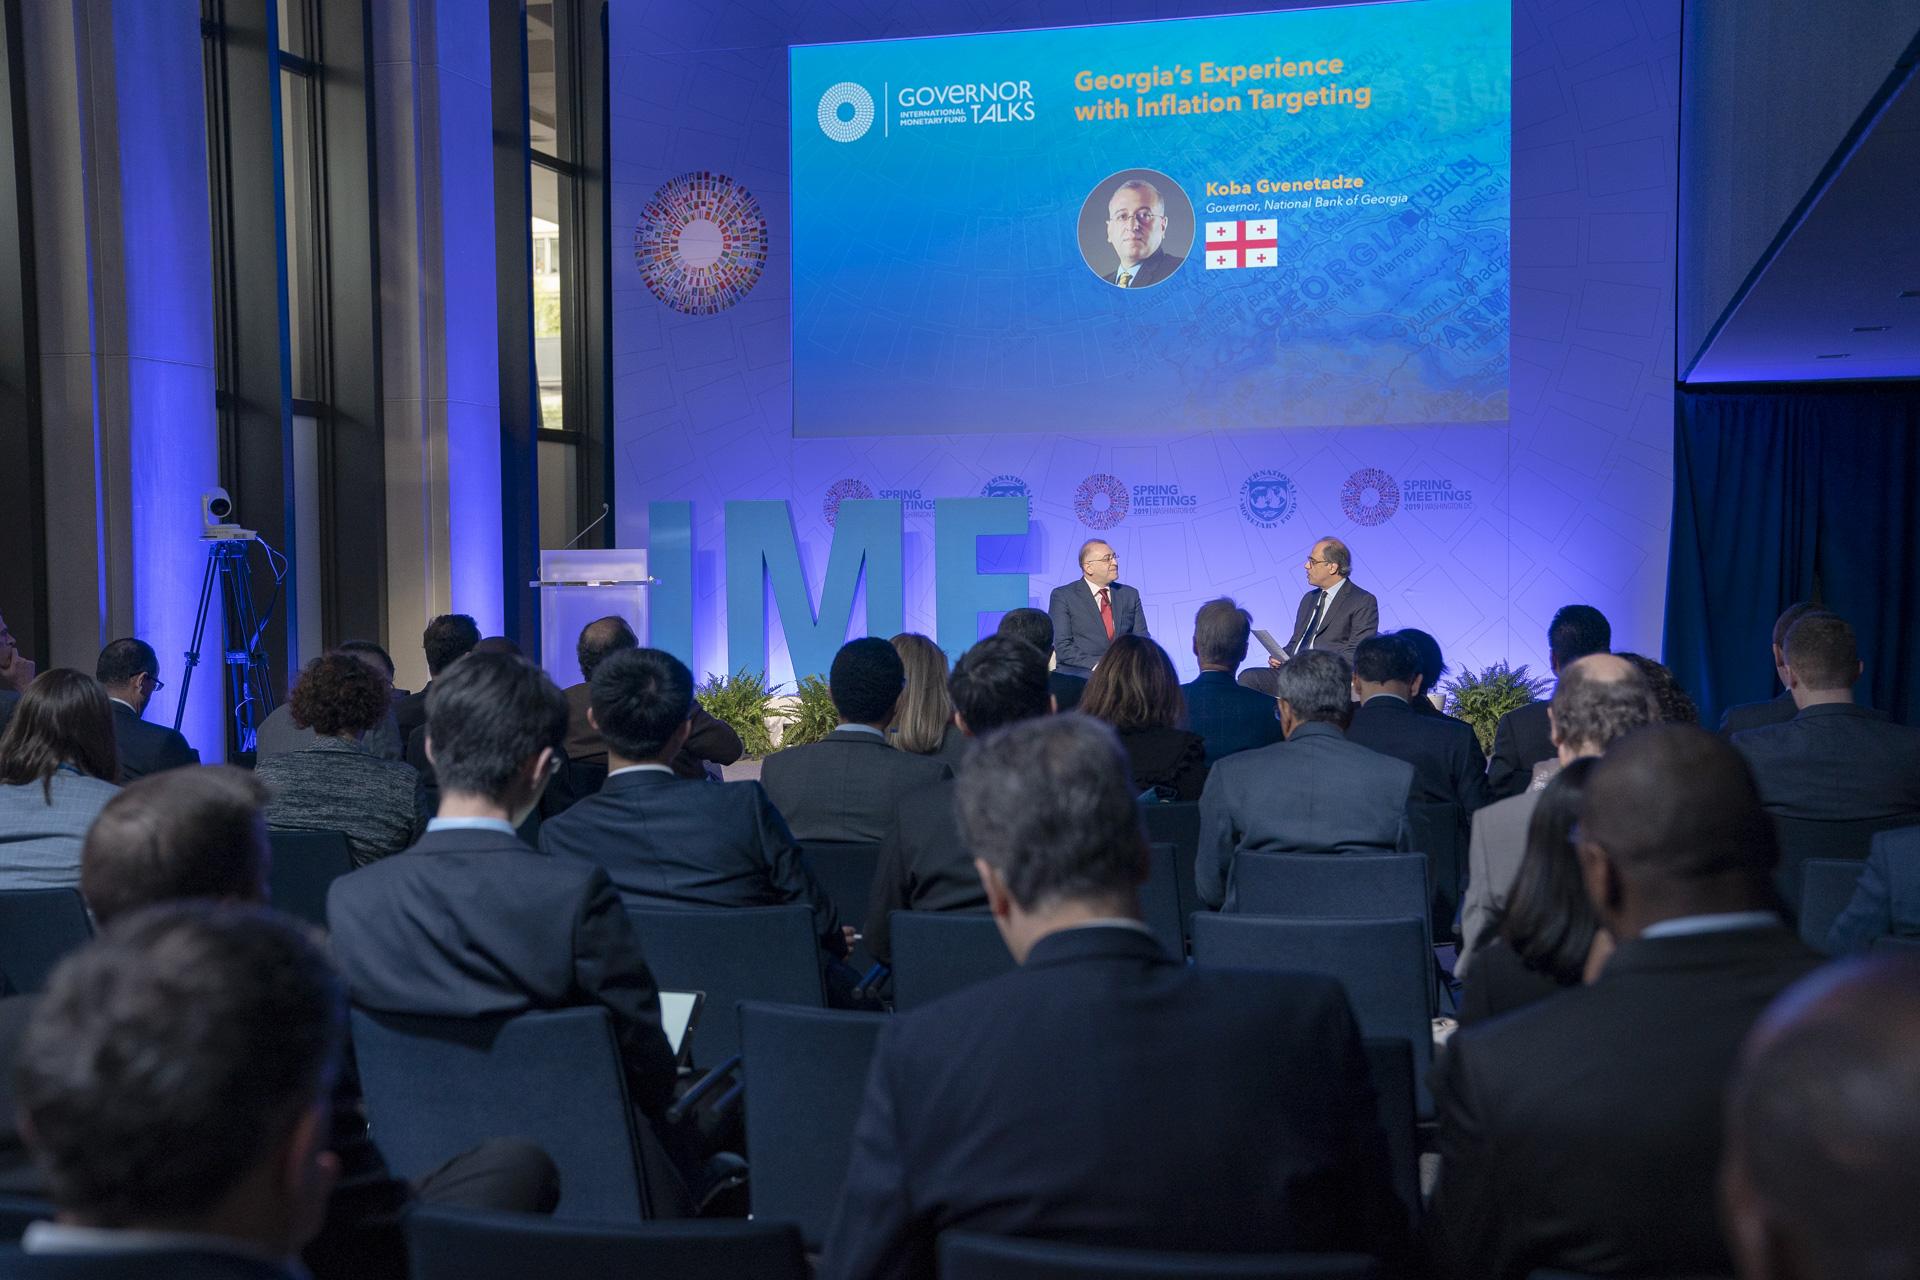 Governor Talks: Romuald Wadagni, Minister of Economy and